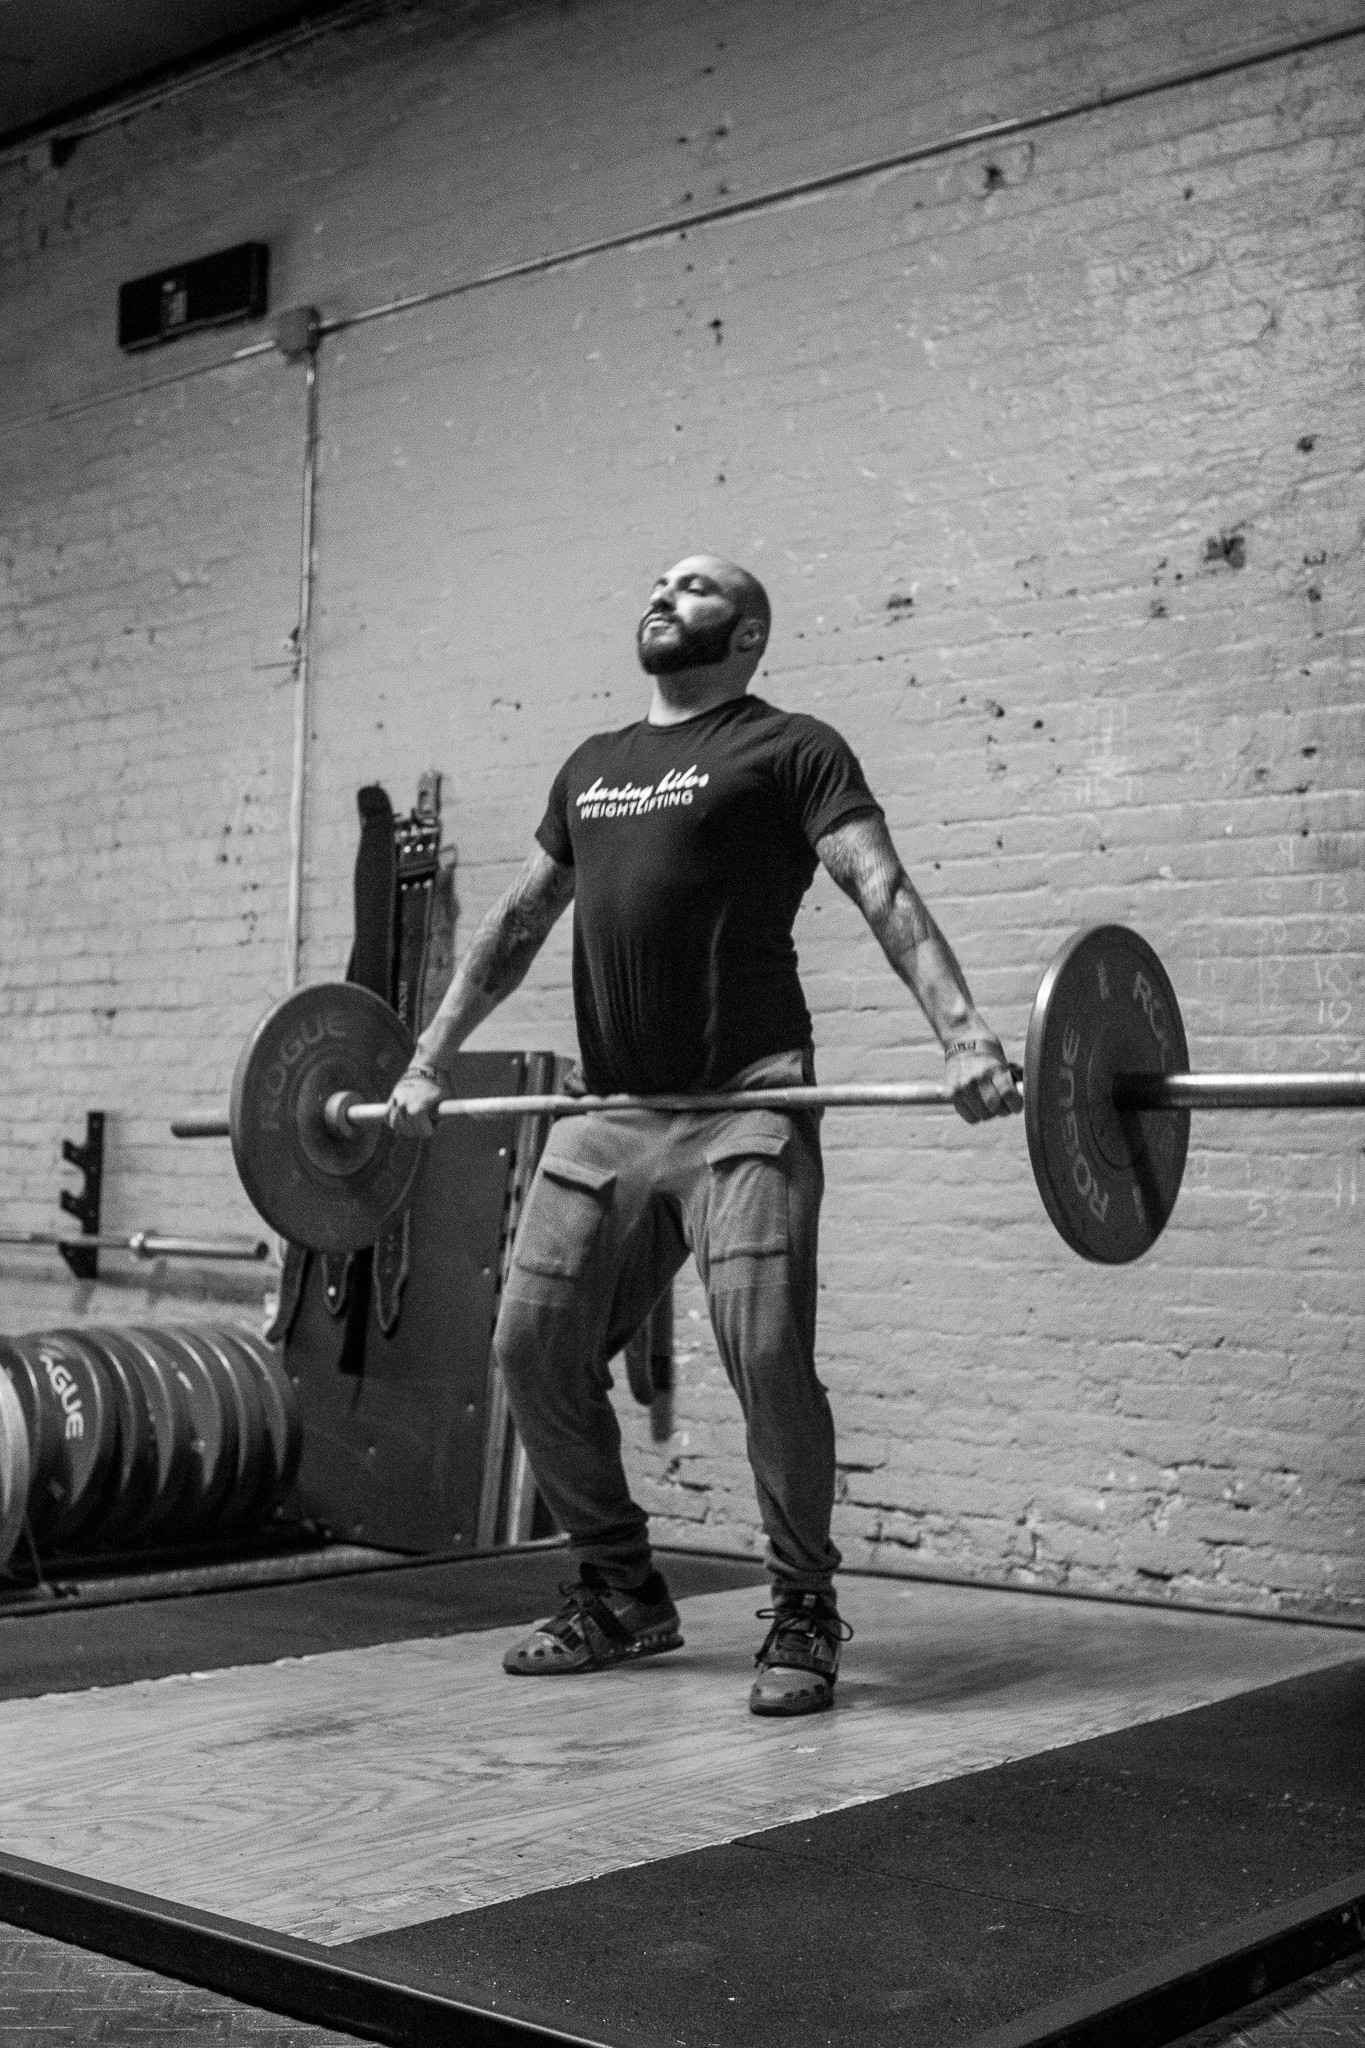 james-wright-visit-brooklyn-new-york-weightlifting-coach-teammates-october-2016 (28 of 92).jpg